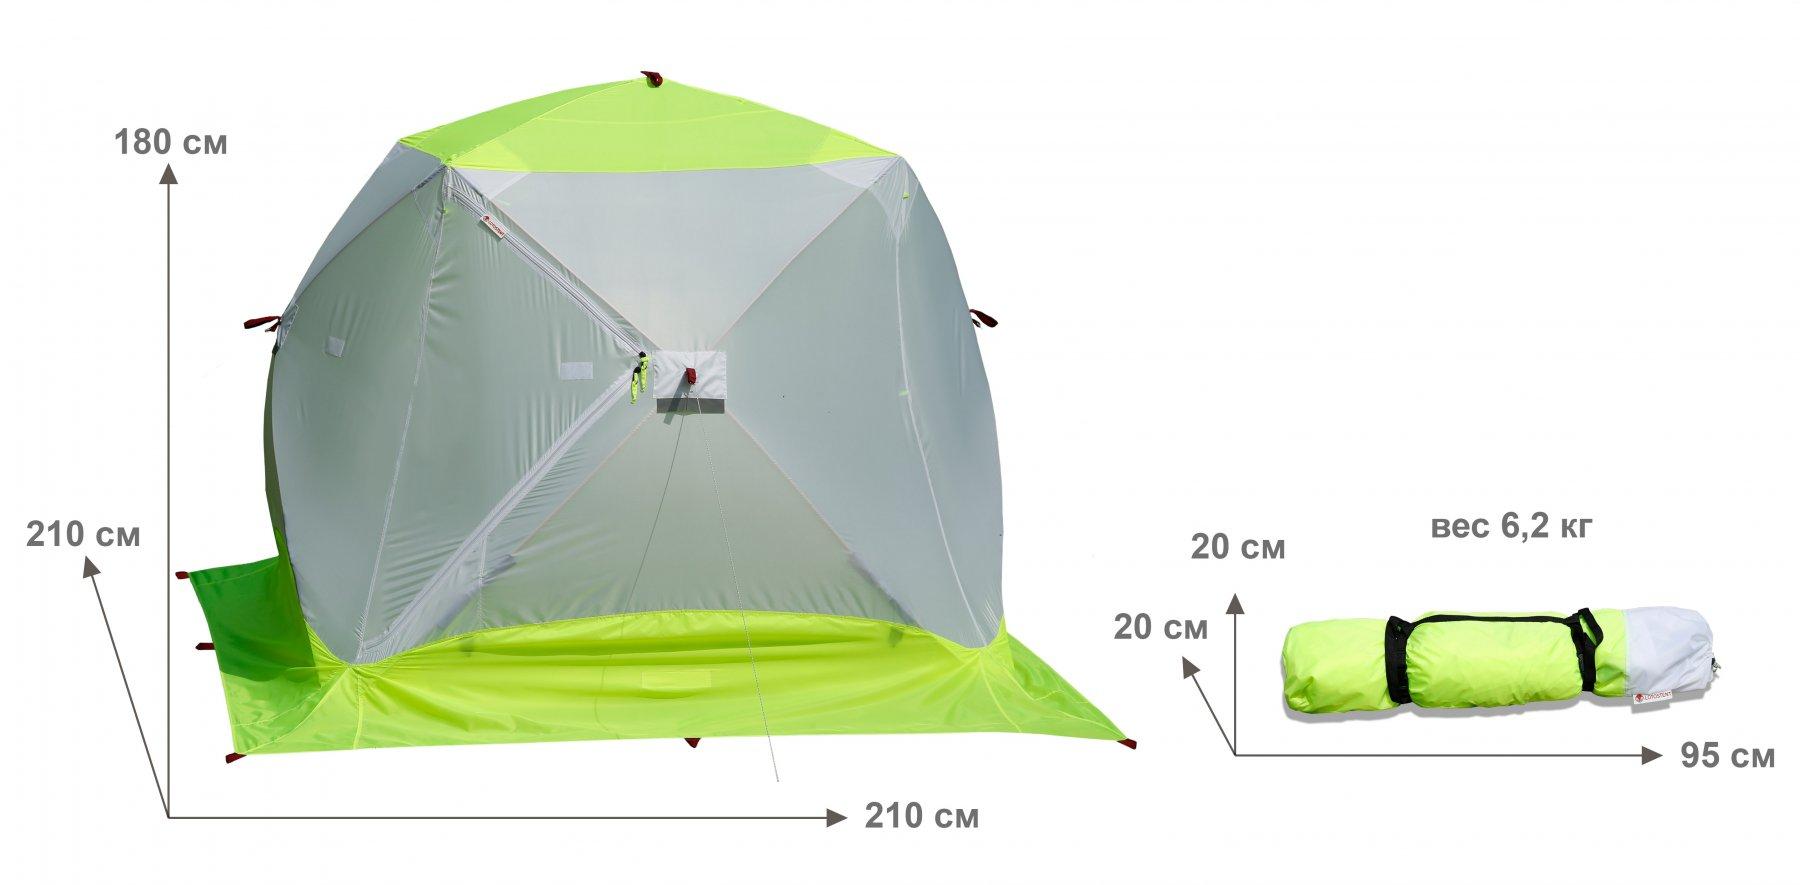 Зимняя палатка ЛОТОС Куб 3 Компакт ЭКО (габаритные размеры)